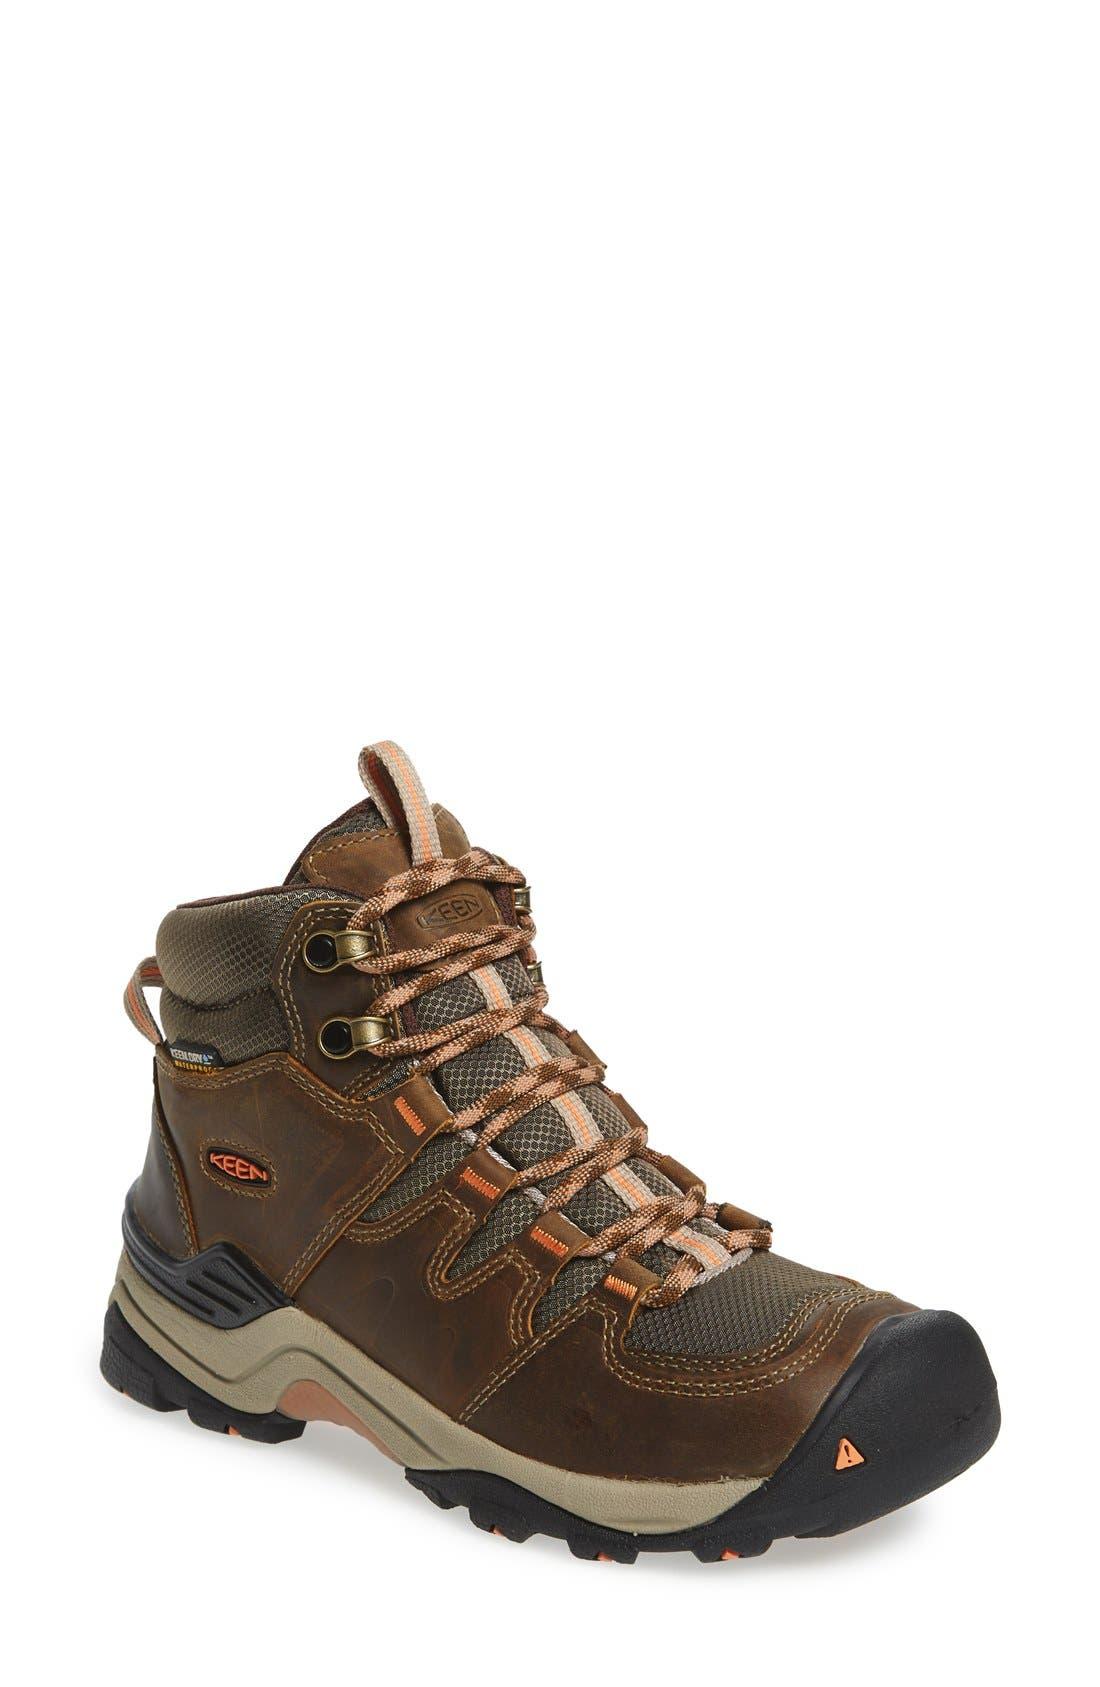 Gypsum II Mid Waterproof Hiking Boot,                         Main,                         color, 200